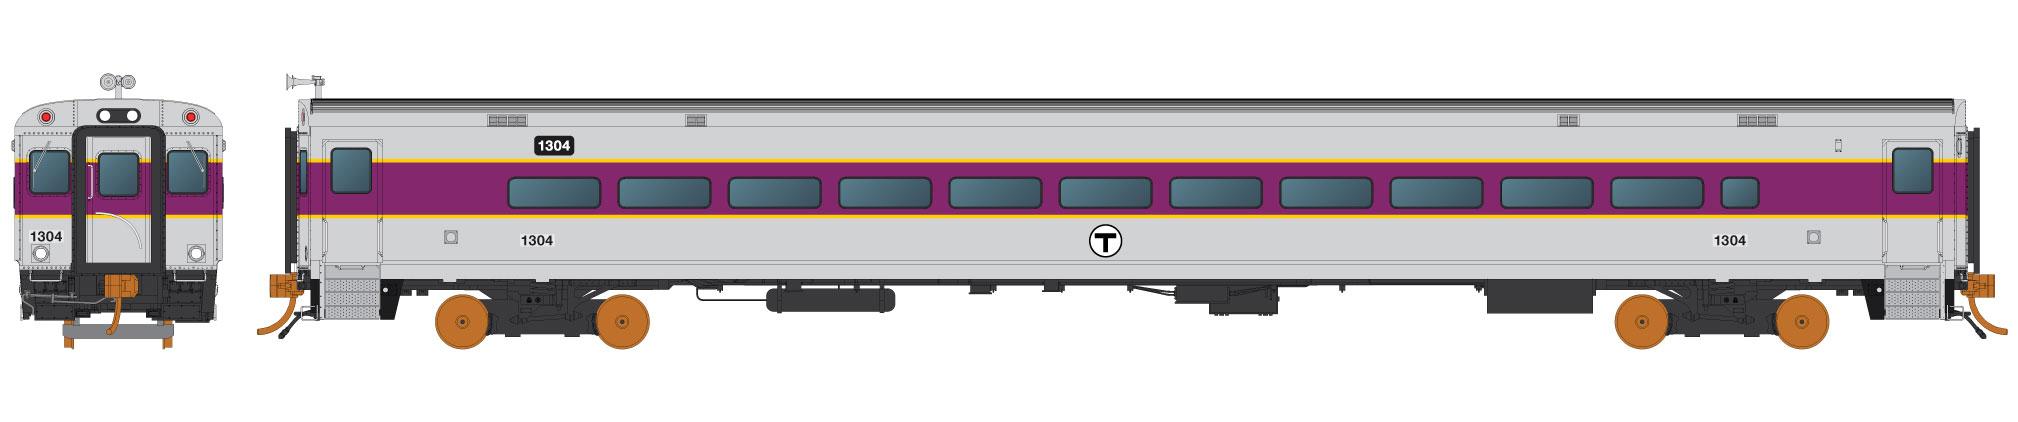 Rapido 128507 - HO Scale Comet Commuter Car - MBTA Set 1